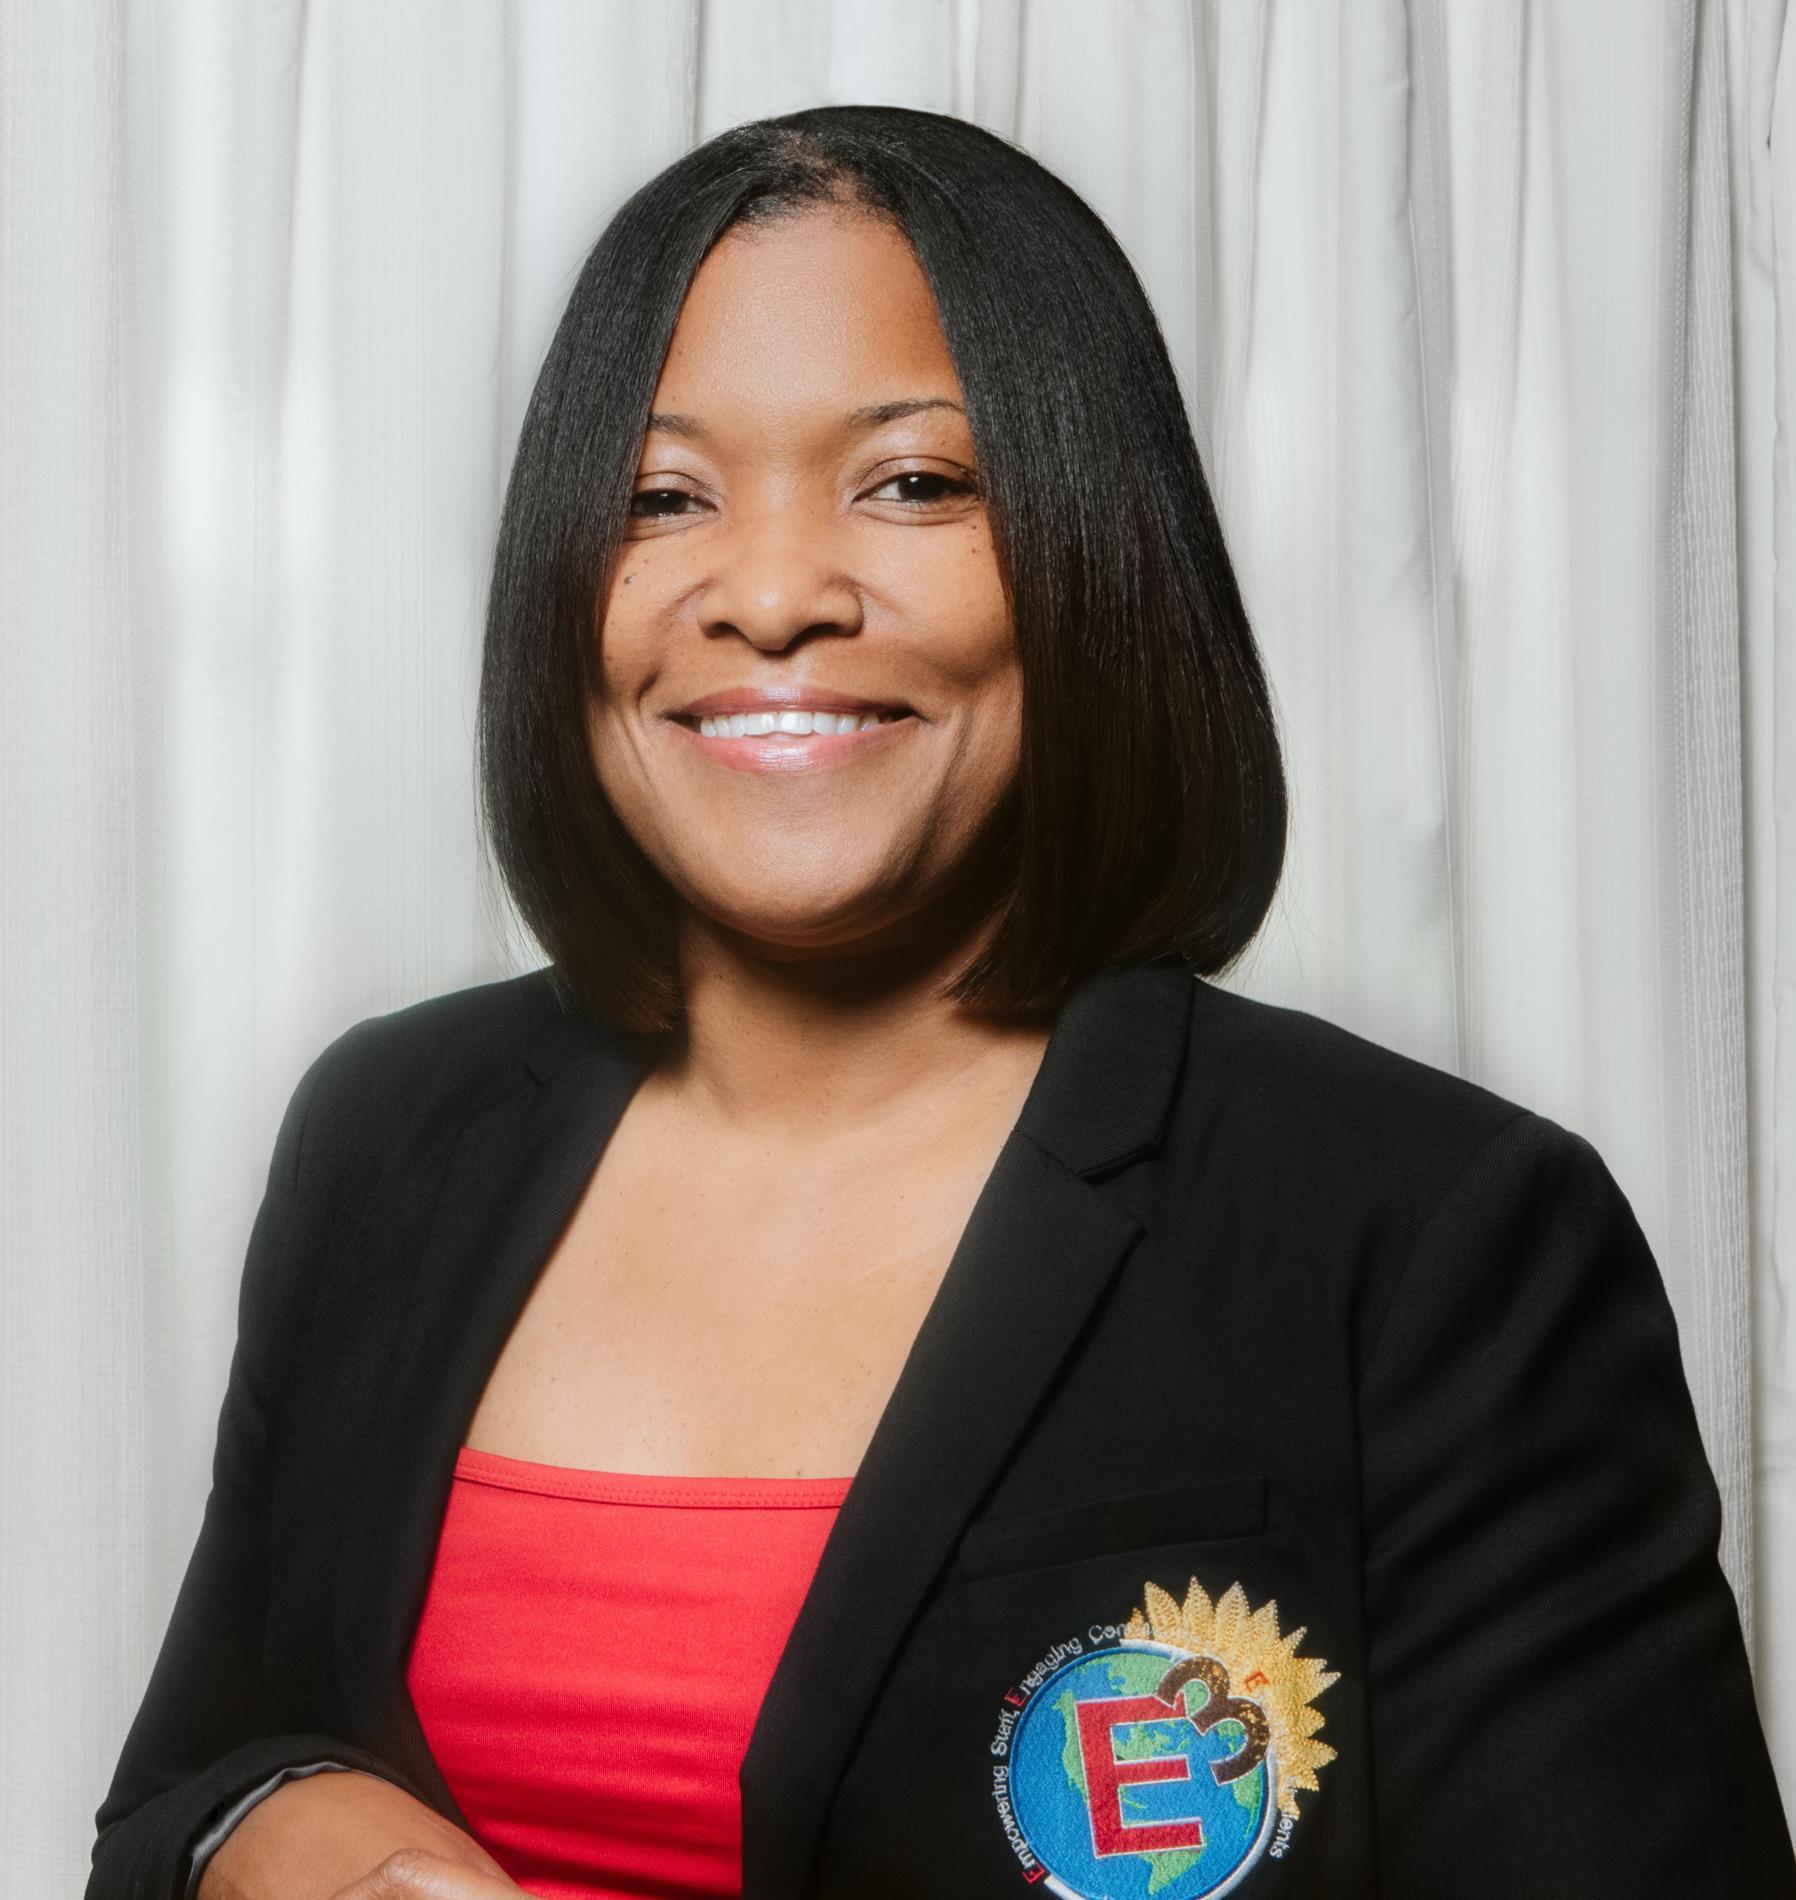 Superintendent Miskia Davis